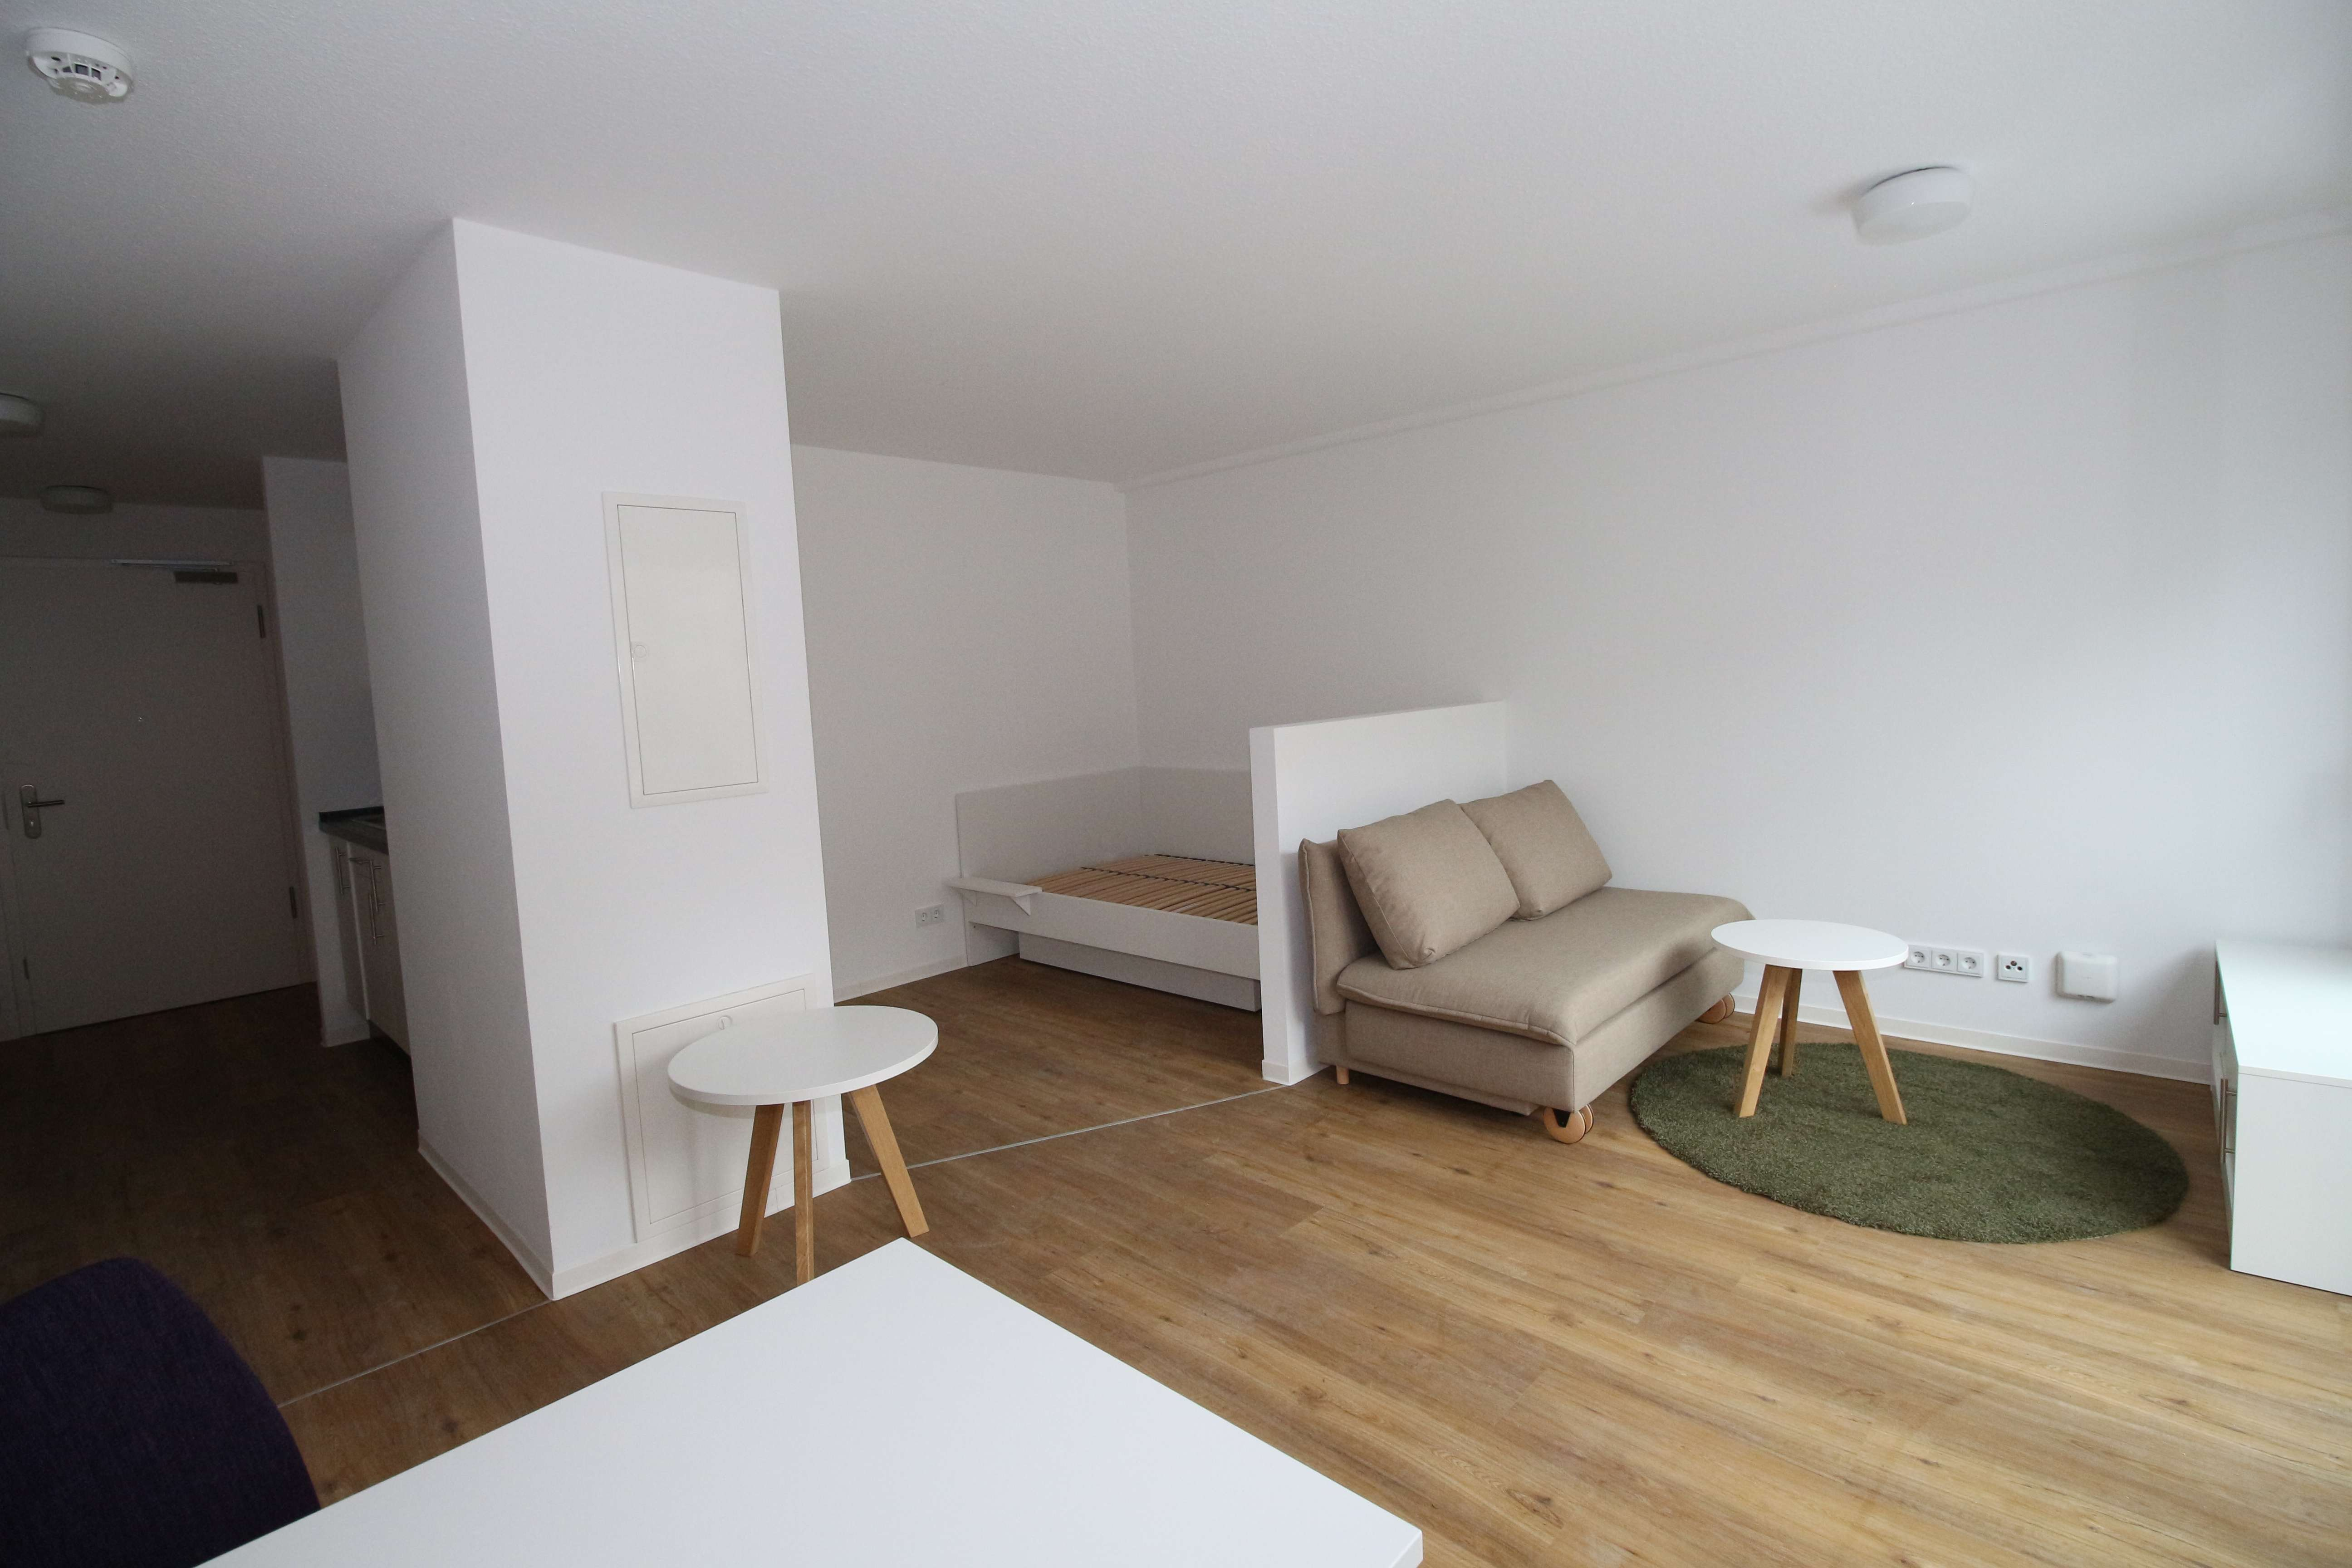 Schickes, voll möbliertes Mikro-Apartment in zentraler Südstadt-Lage in